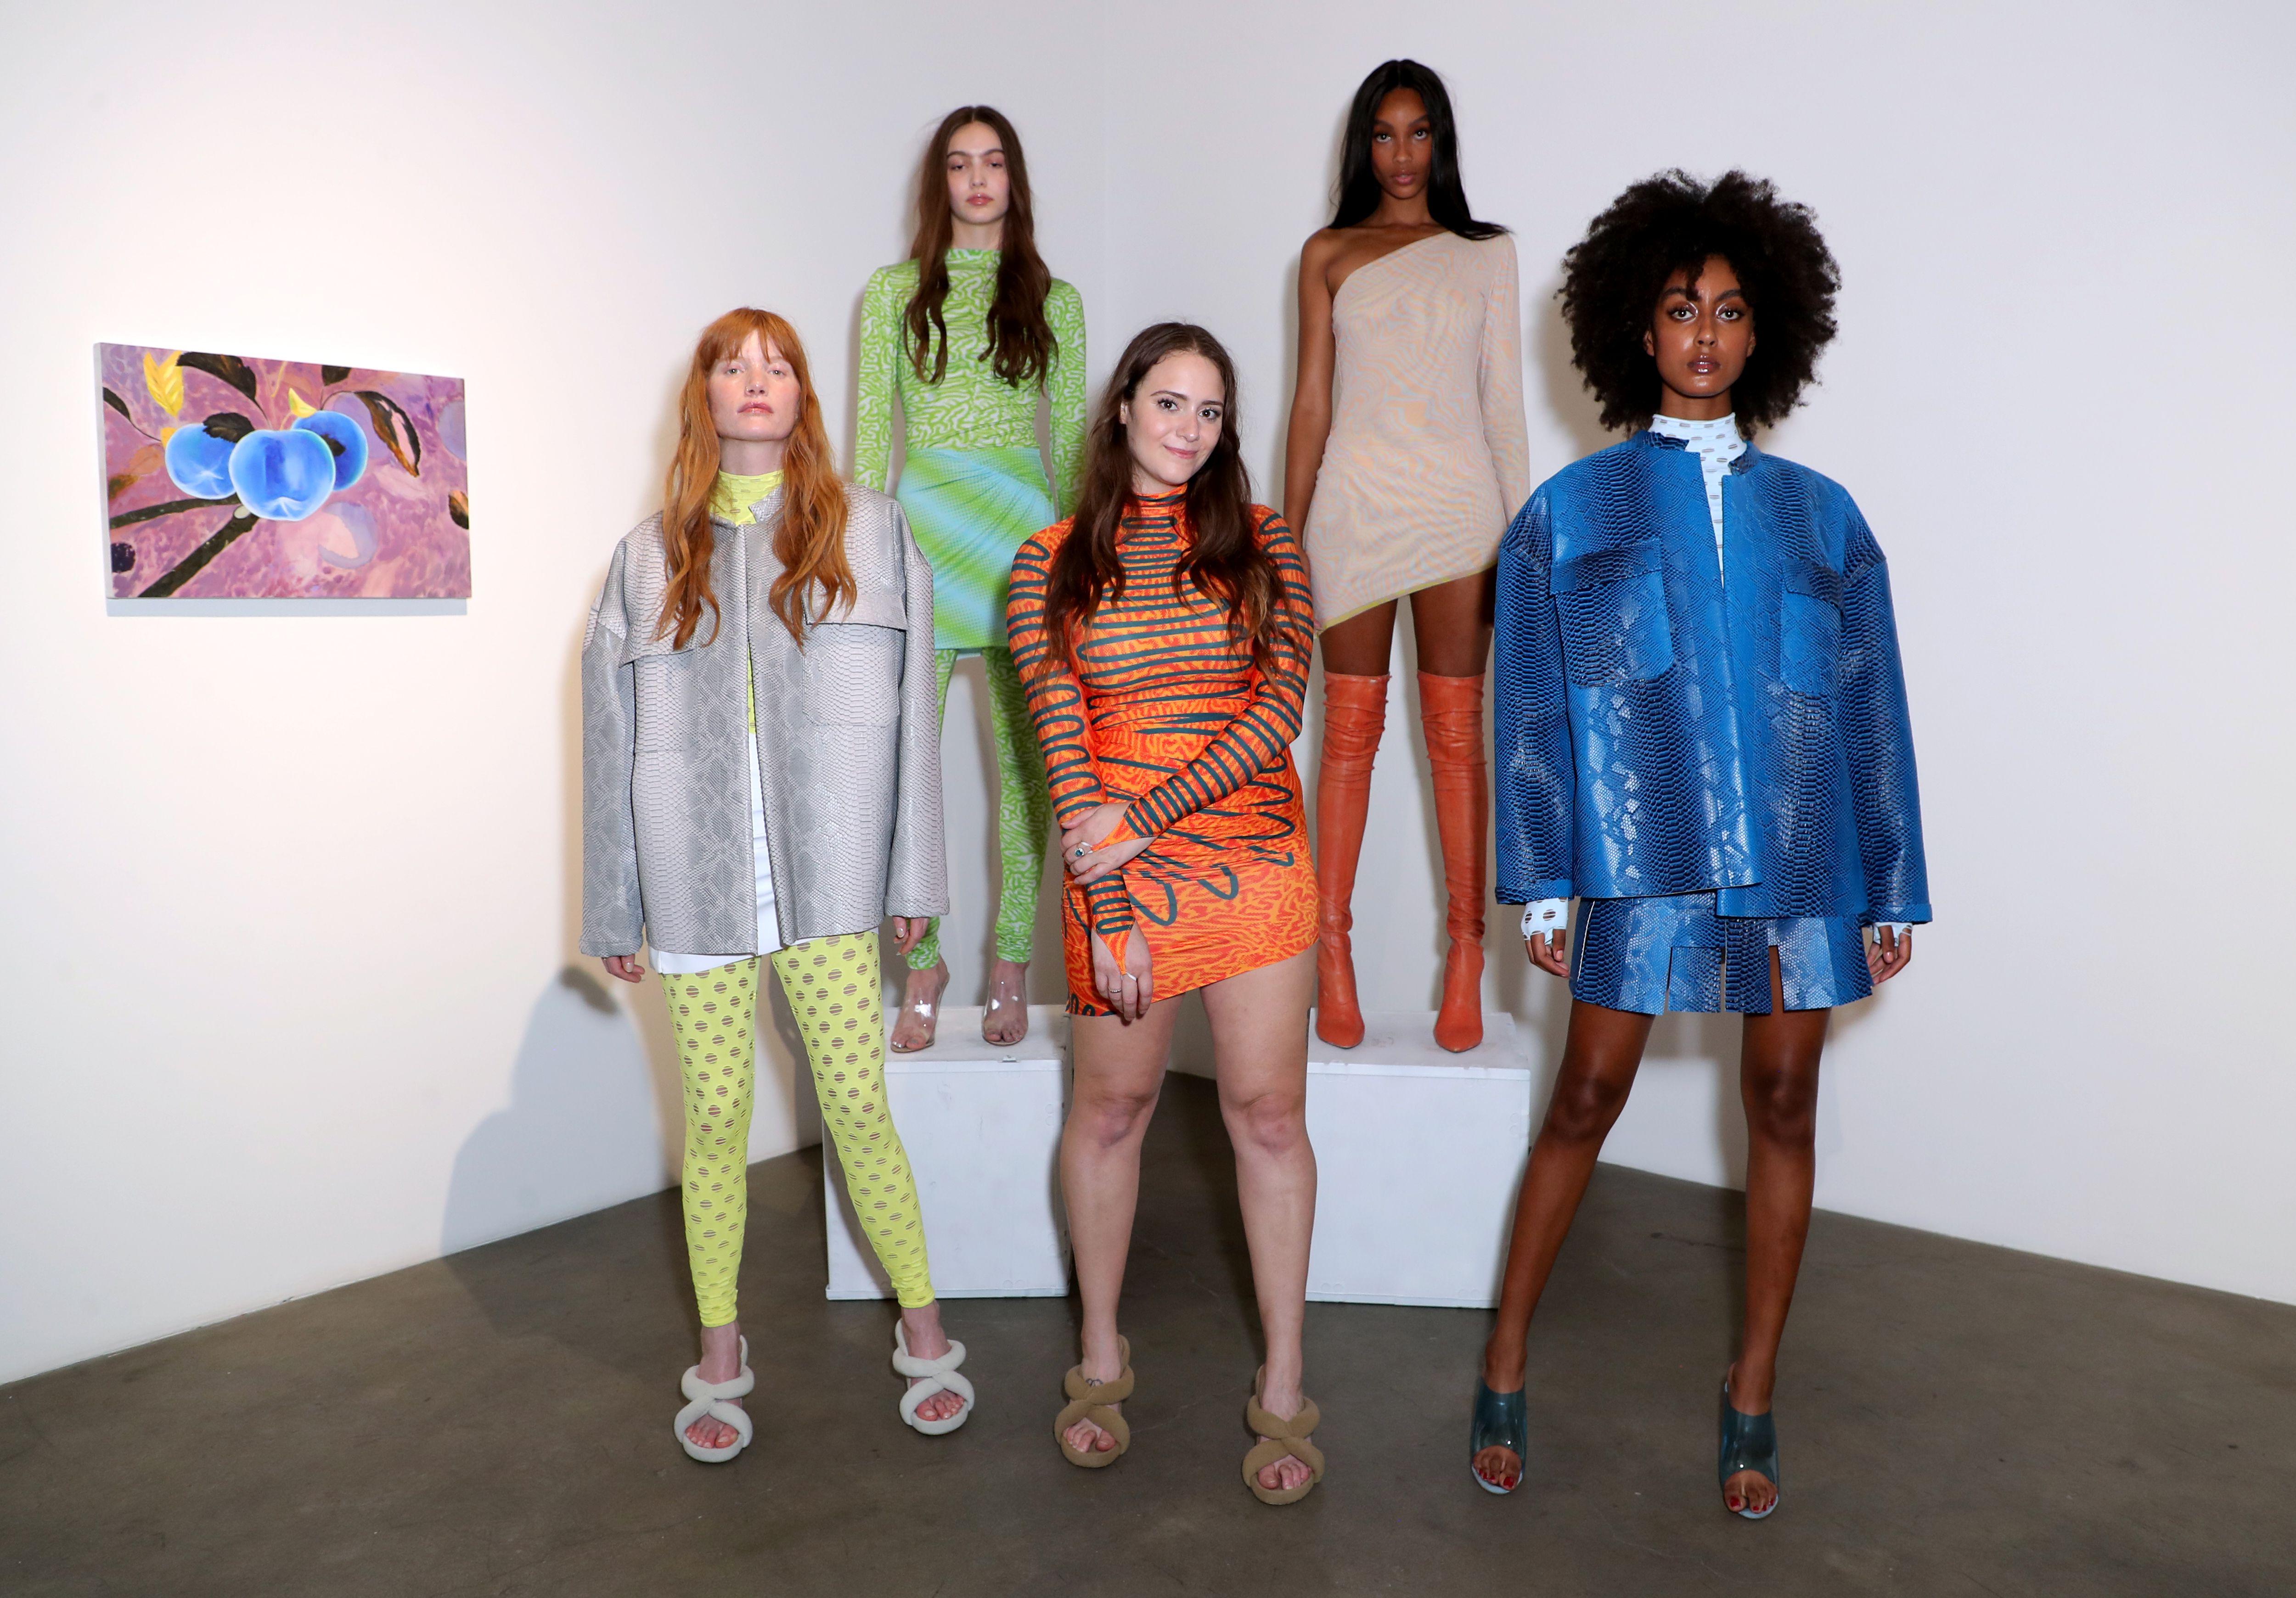 Maisie Wilen and modelsMaisie Wilen Event, Presentation, Night Gallery, Los Angeles, USA - 05 Jun 2019